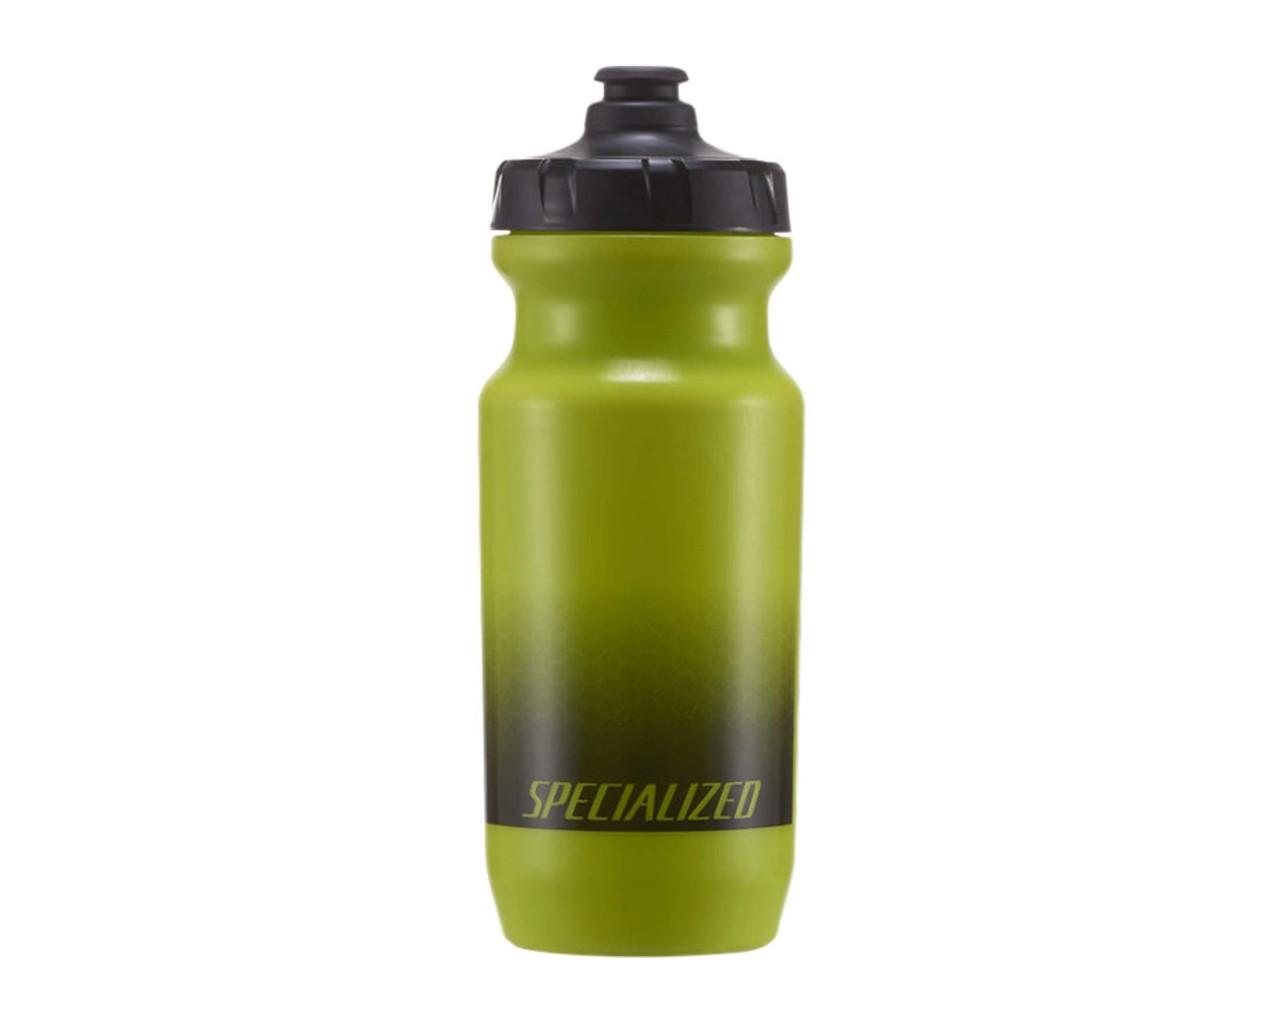 Specialized Little Big Mouth 2nd Generation Bottle 21oz | hex fade hyper green black